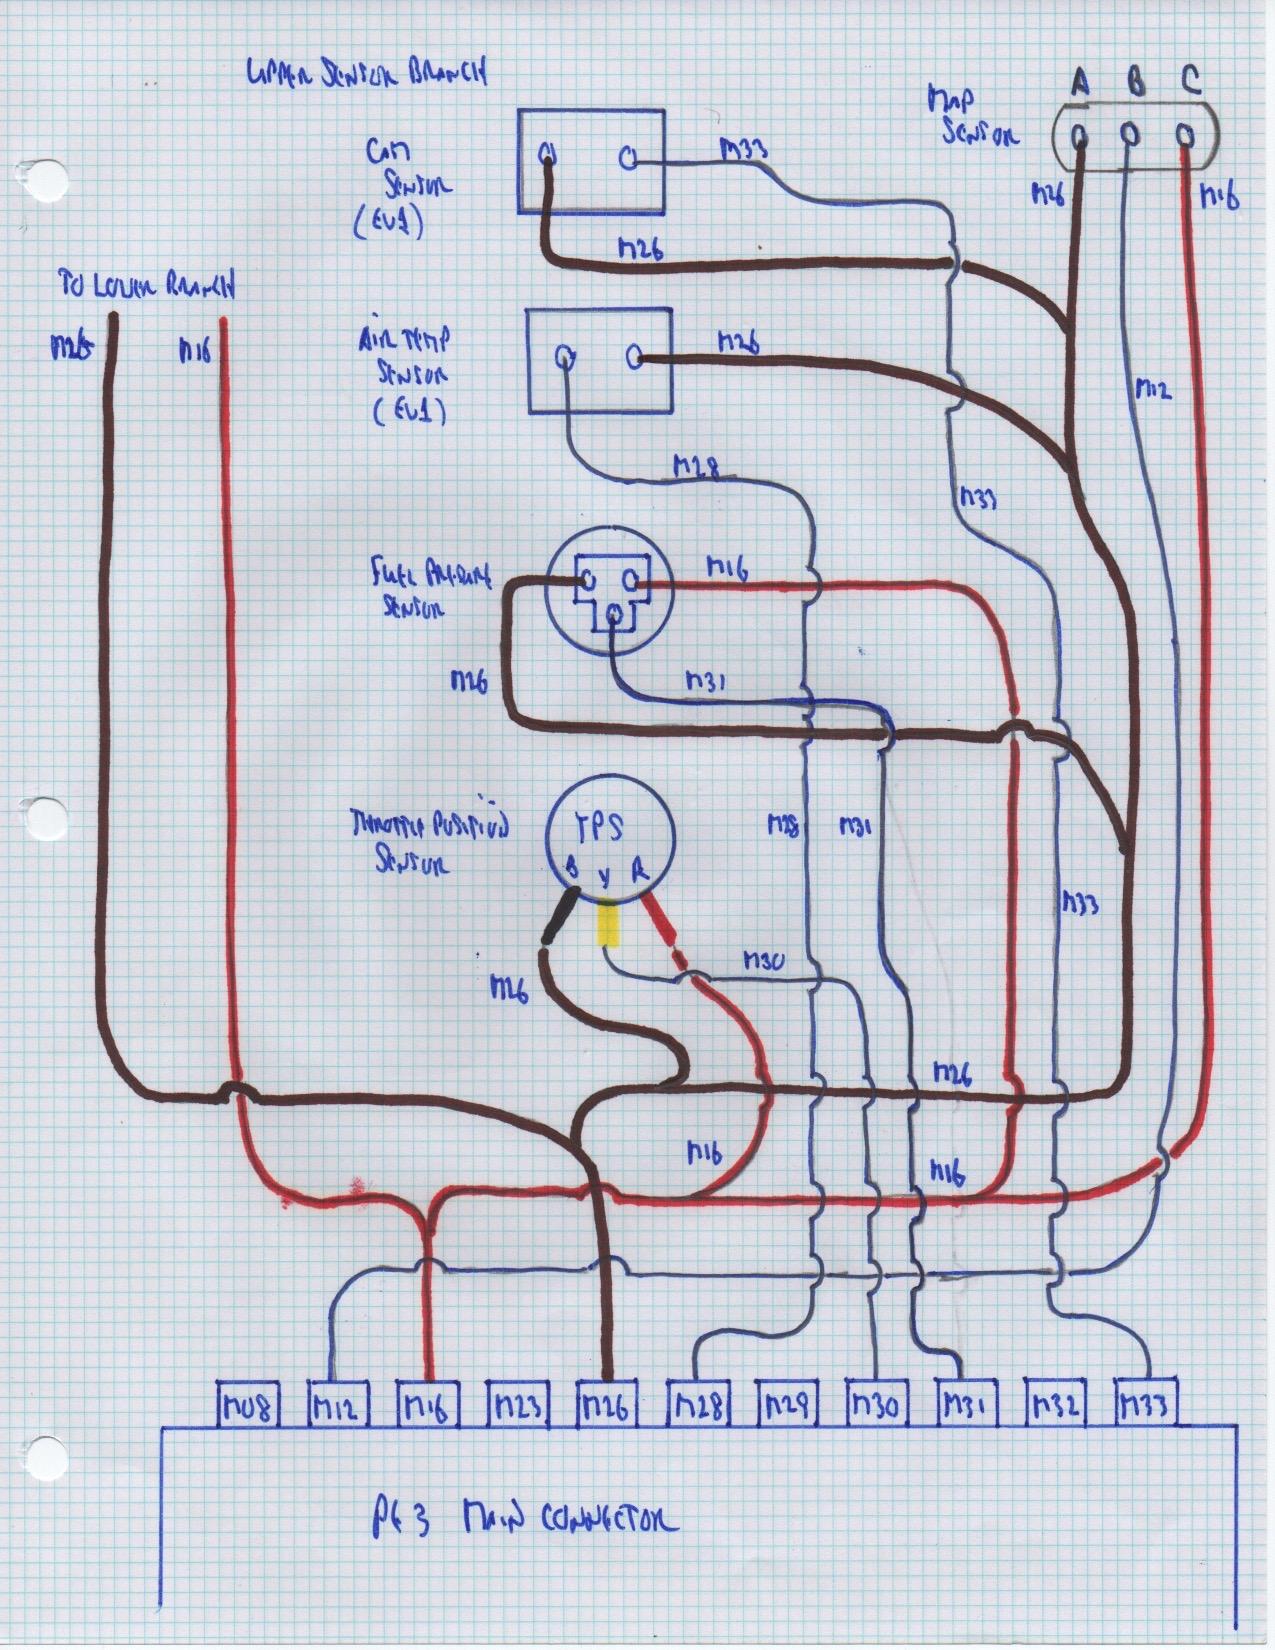 Branch Wiring Diagram Improve Multi Wire Circuit Upper Sensor Junk Yard Zetec Rh Junkyardzetec Com